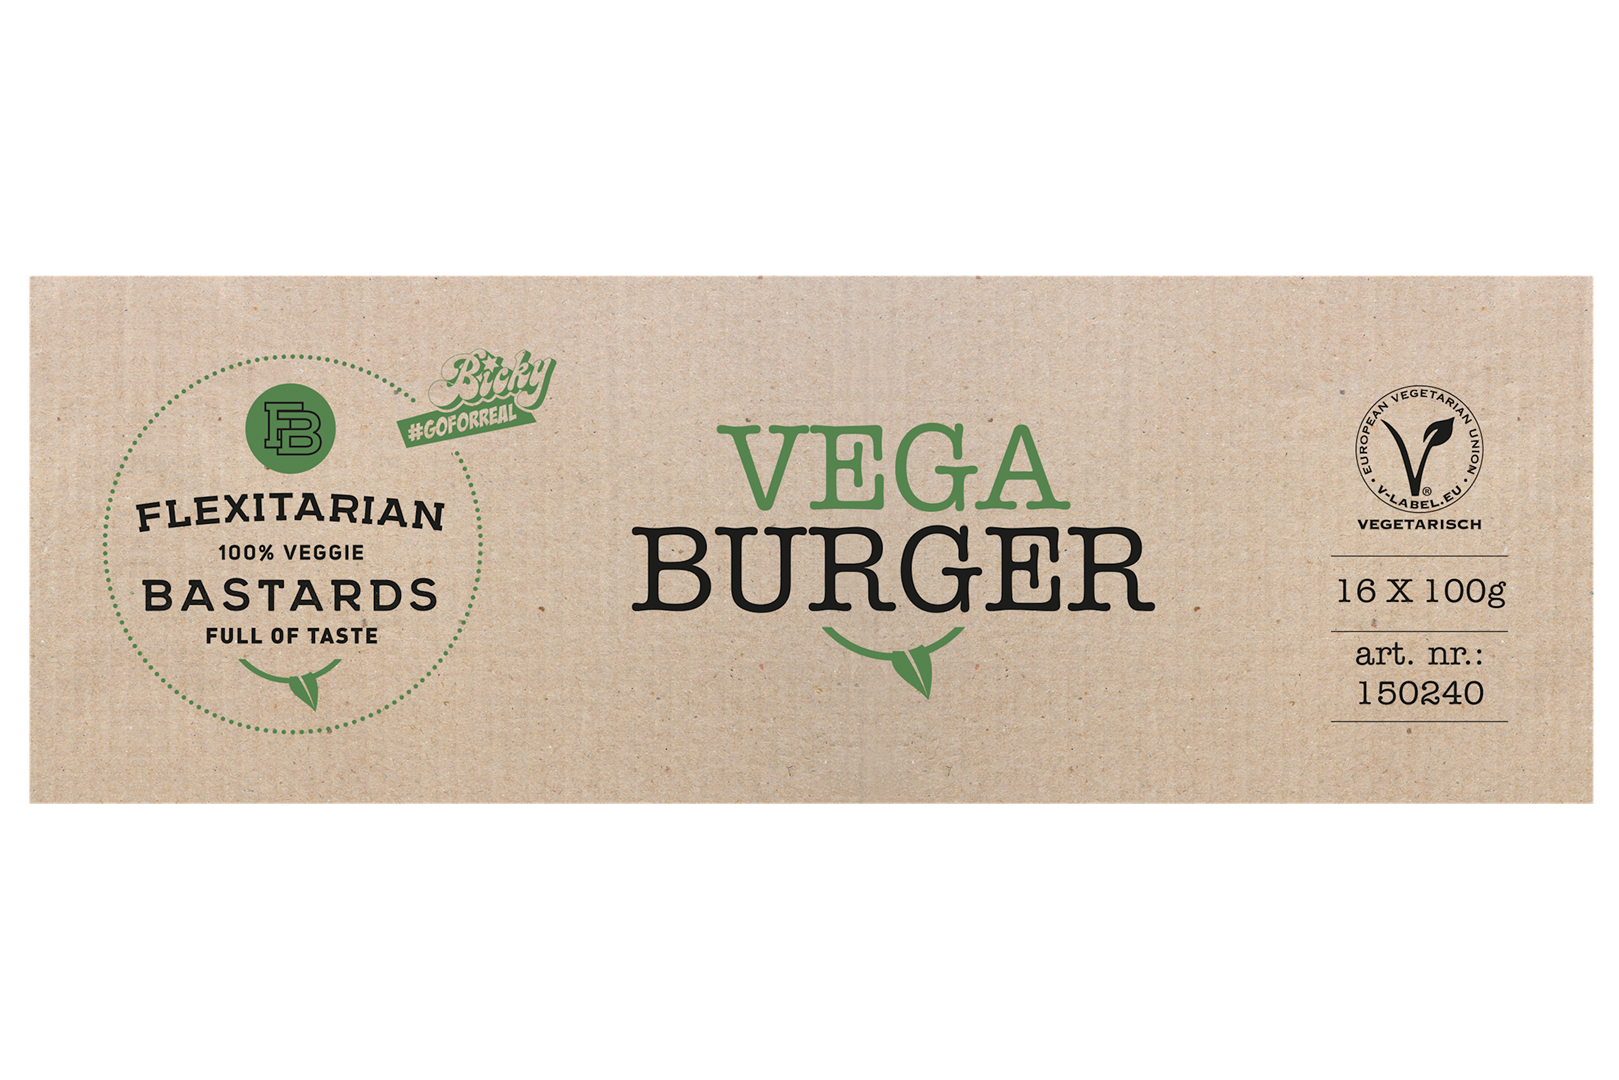 Productafbeelding FLEXITARIAN BASTARDS VEGA BURGER 16X100G  DOOS